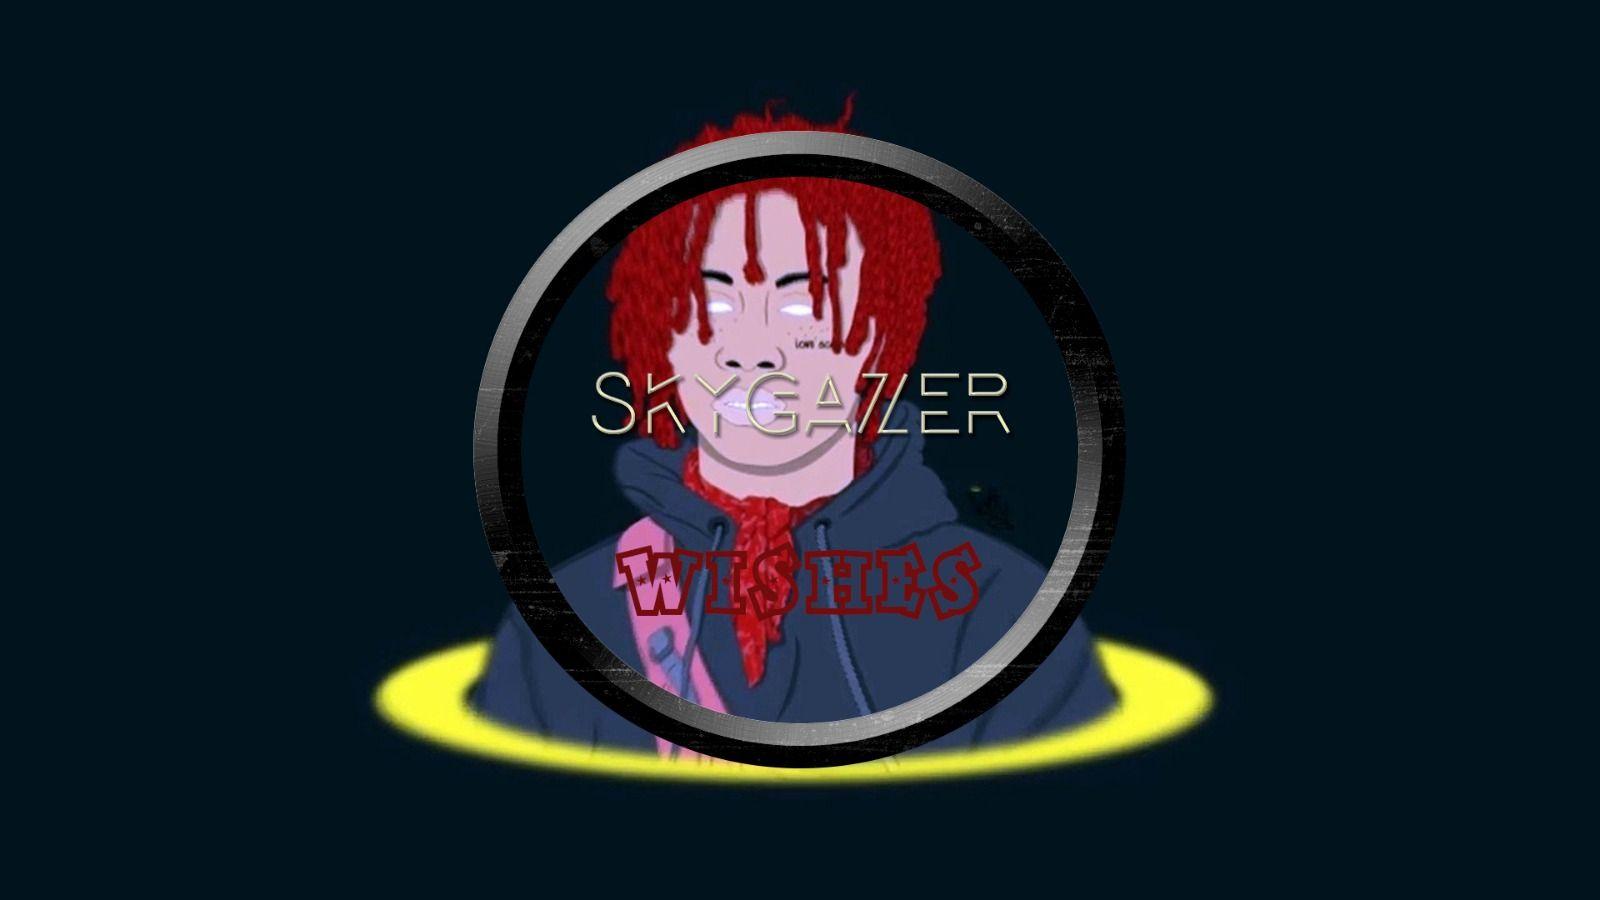 Skygazer Beats - [FREE] Trippie Redd Type Beat 2019